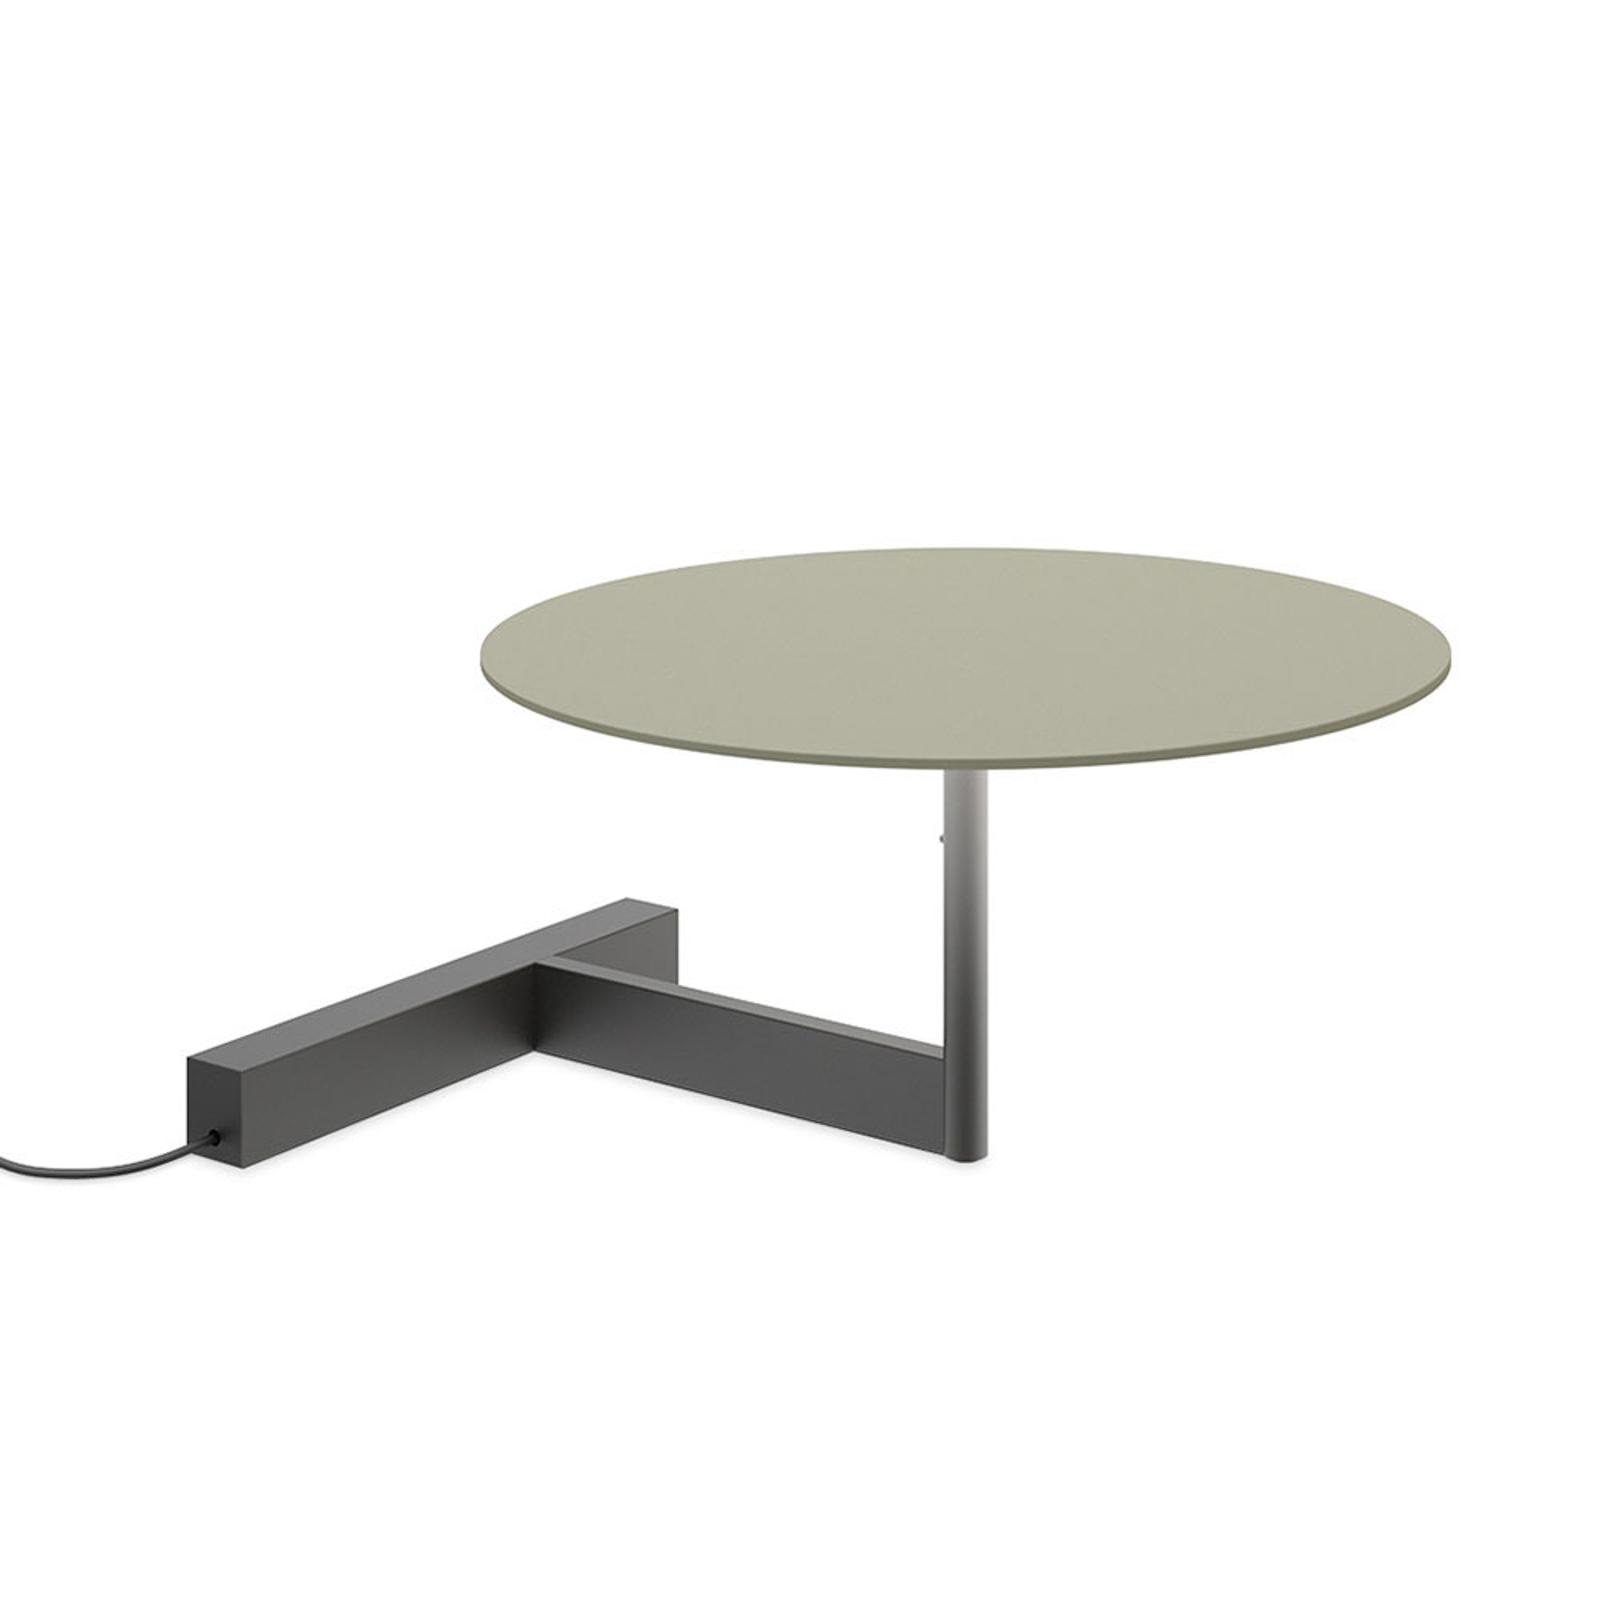 Vibia Flat LED-bordlampe høyde 16 cm grønn L1